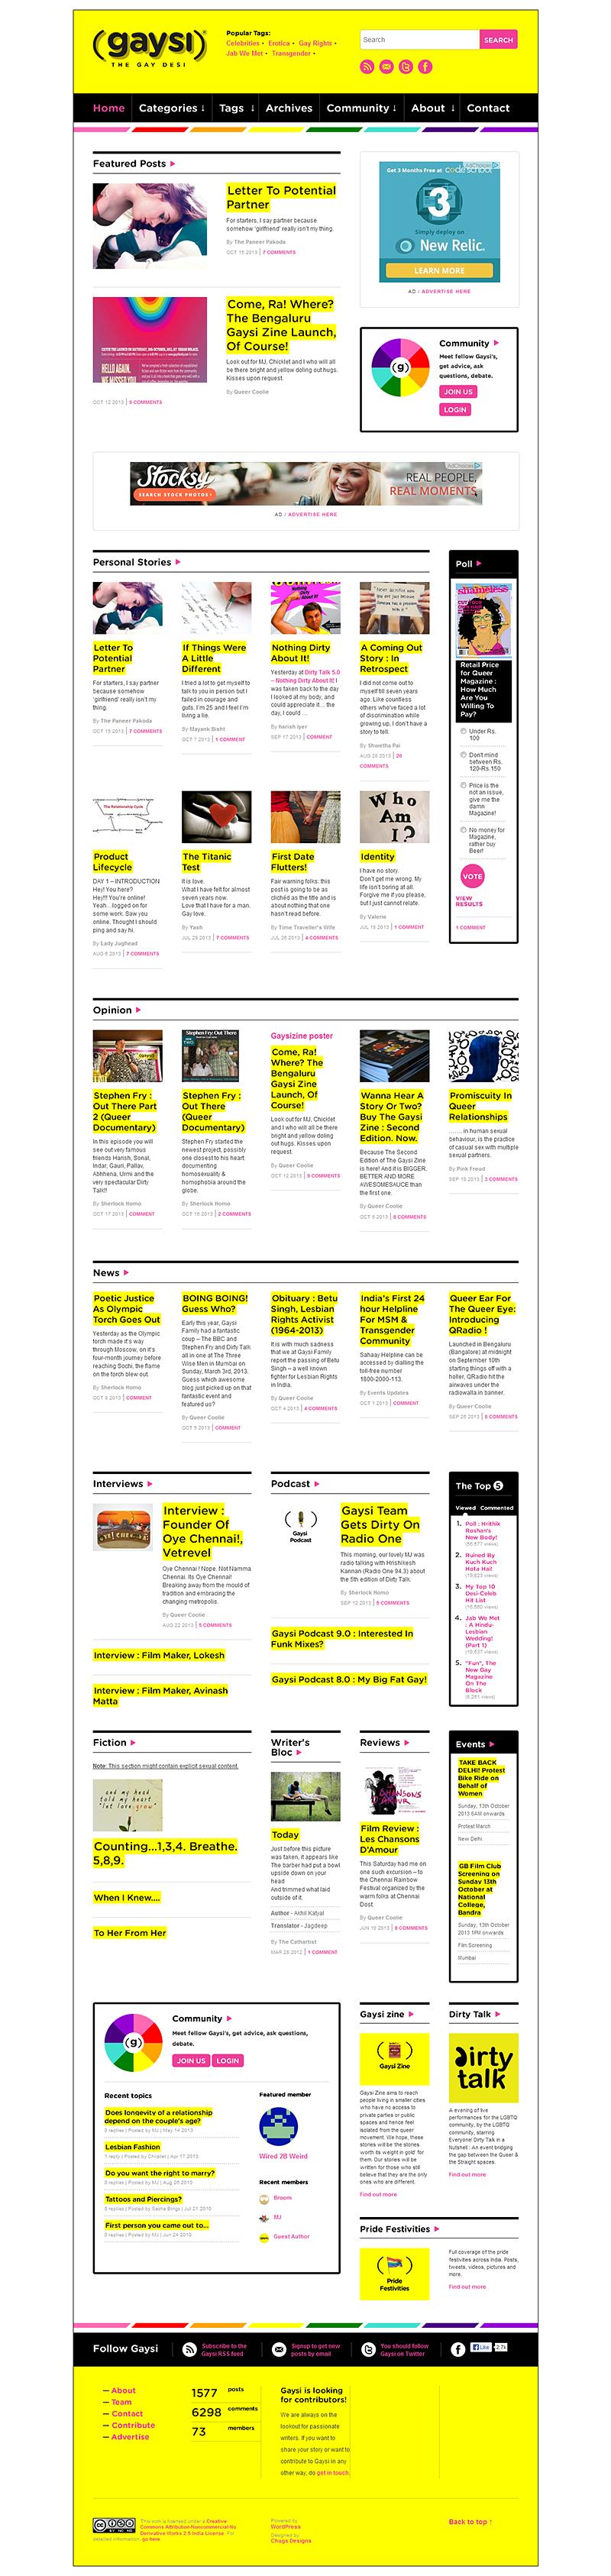 GaysiFamily Website screenshot